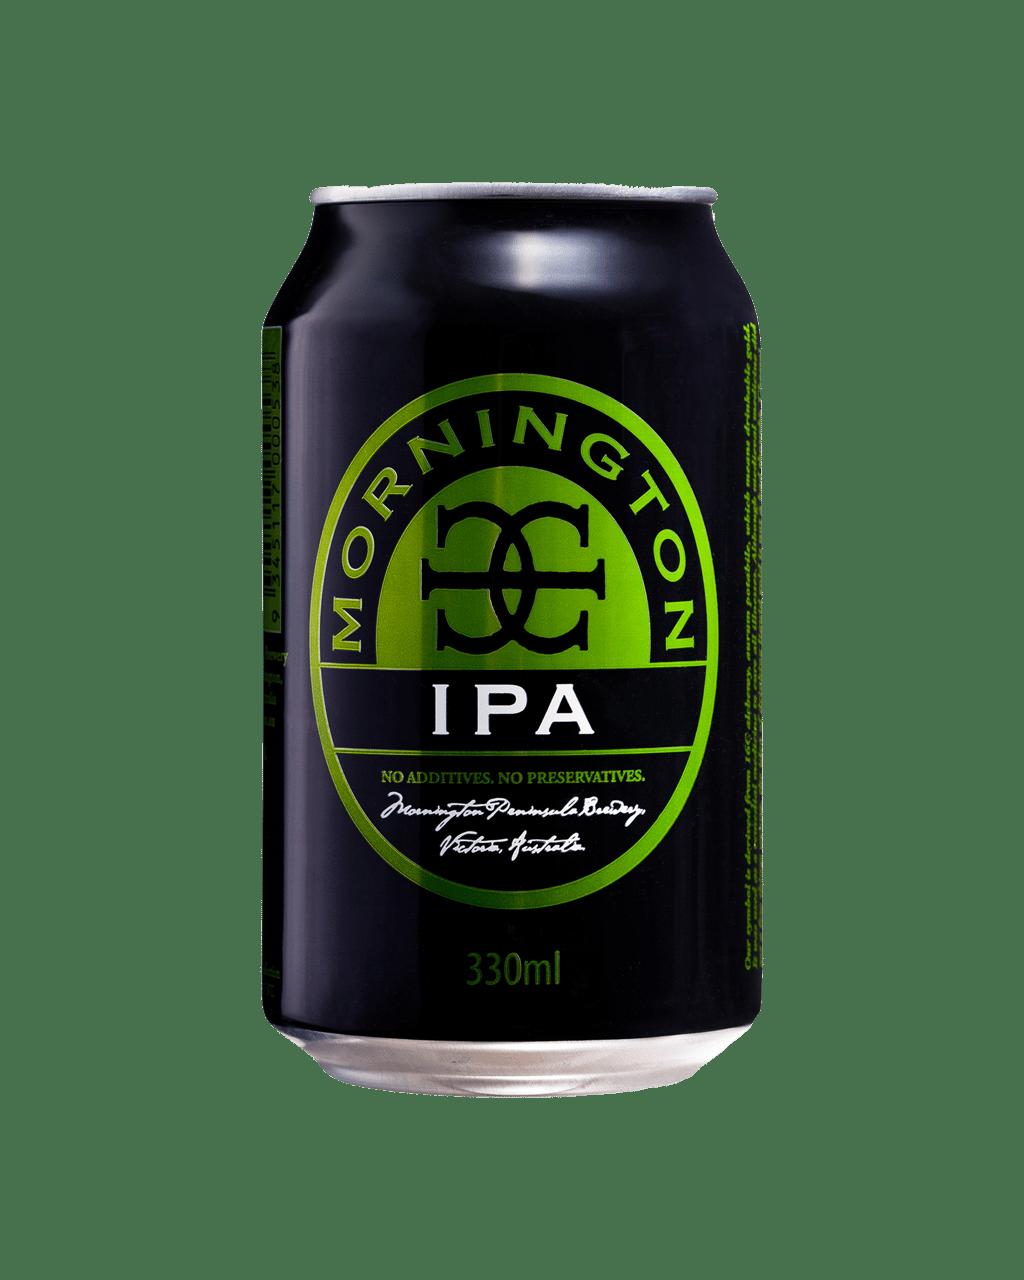 Buy Mornington Peninsula India Pale Ale Cans | Dan Murphy's